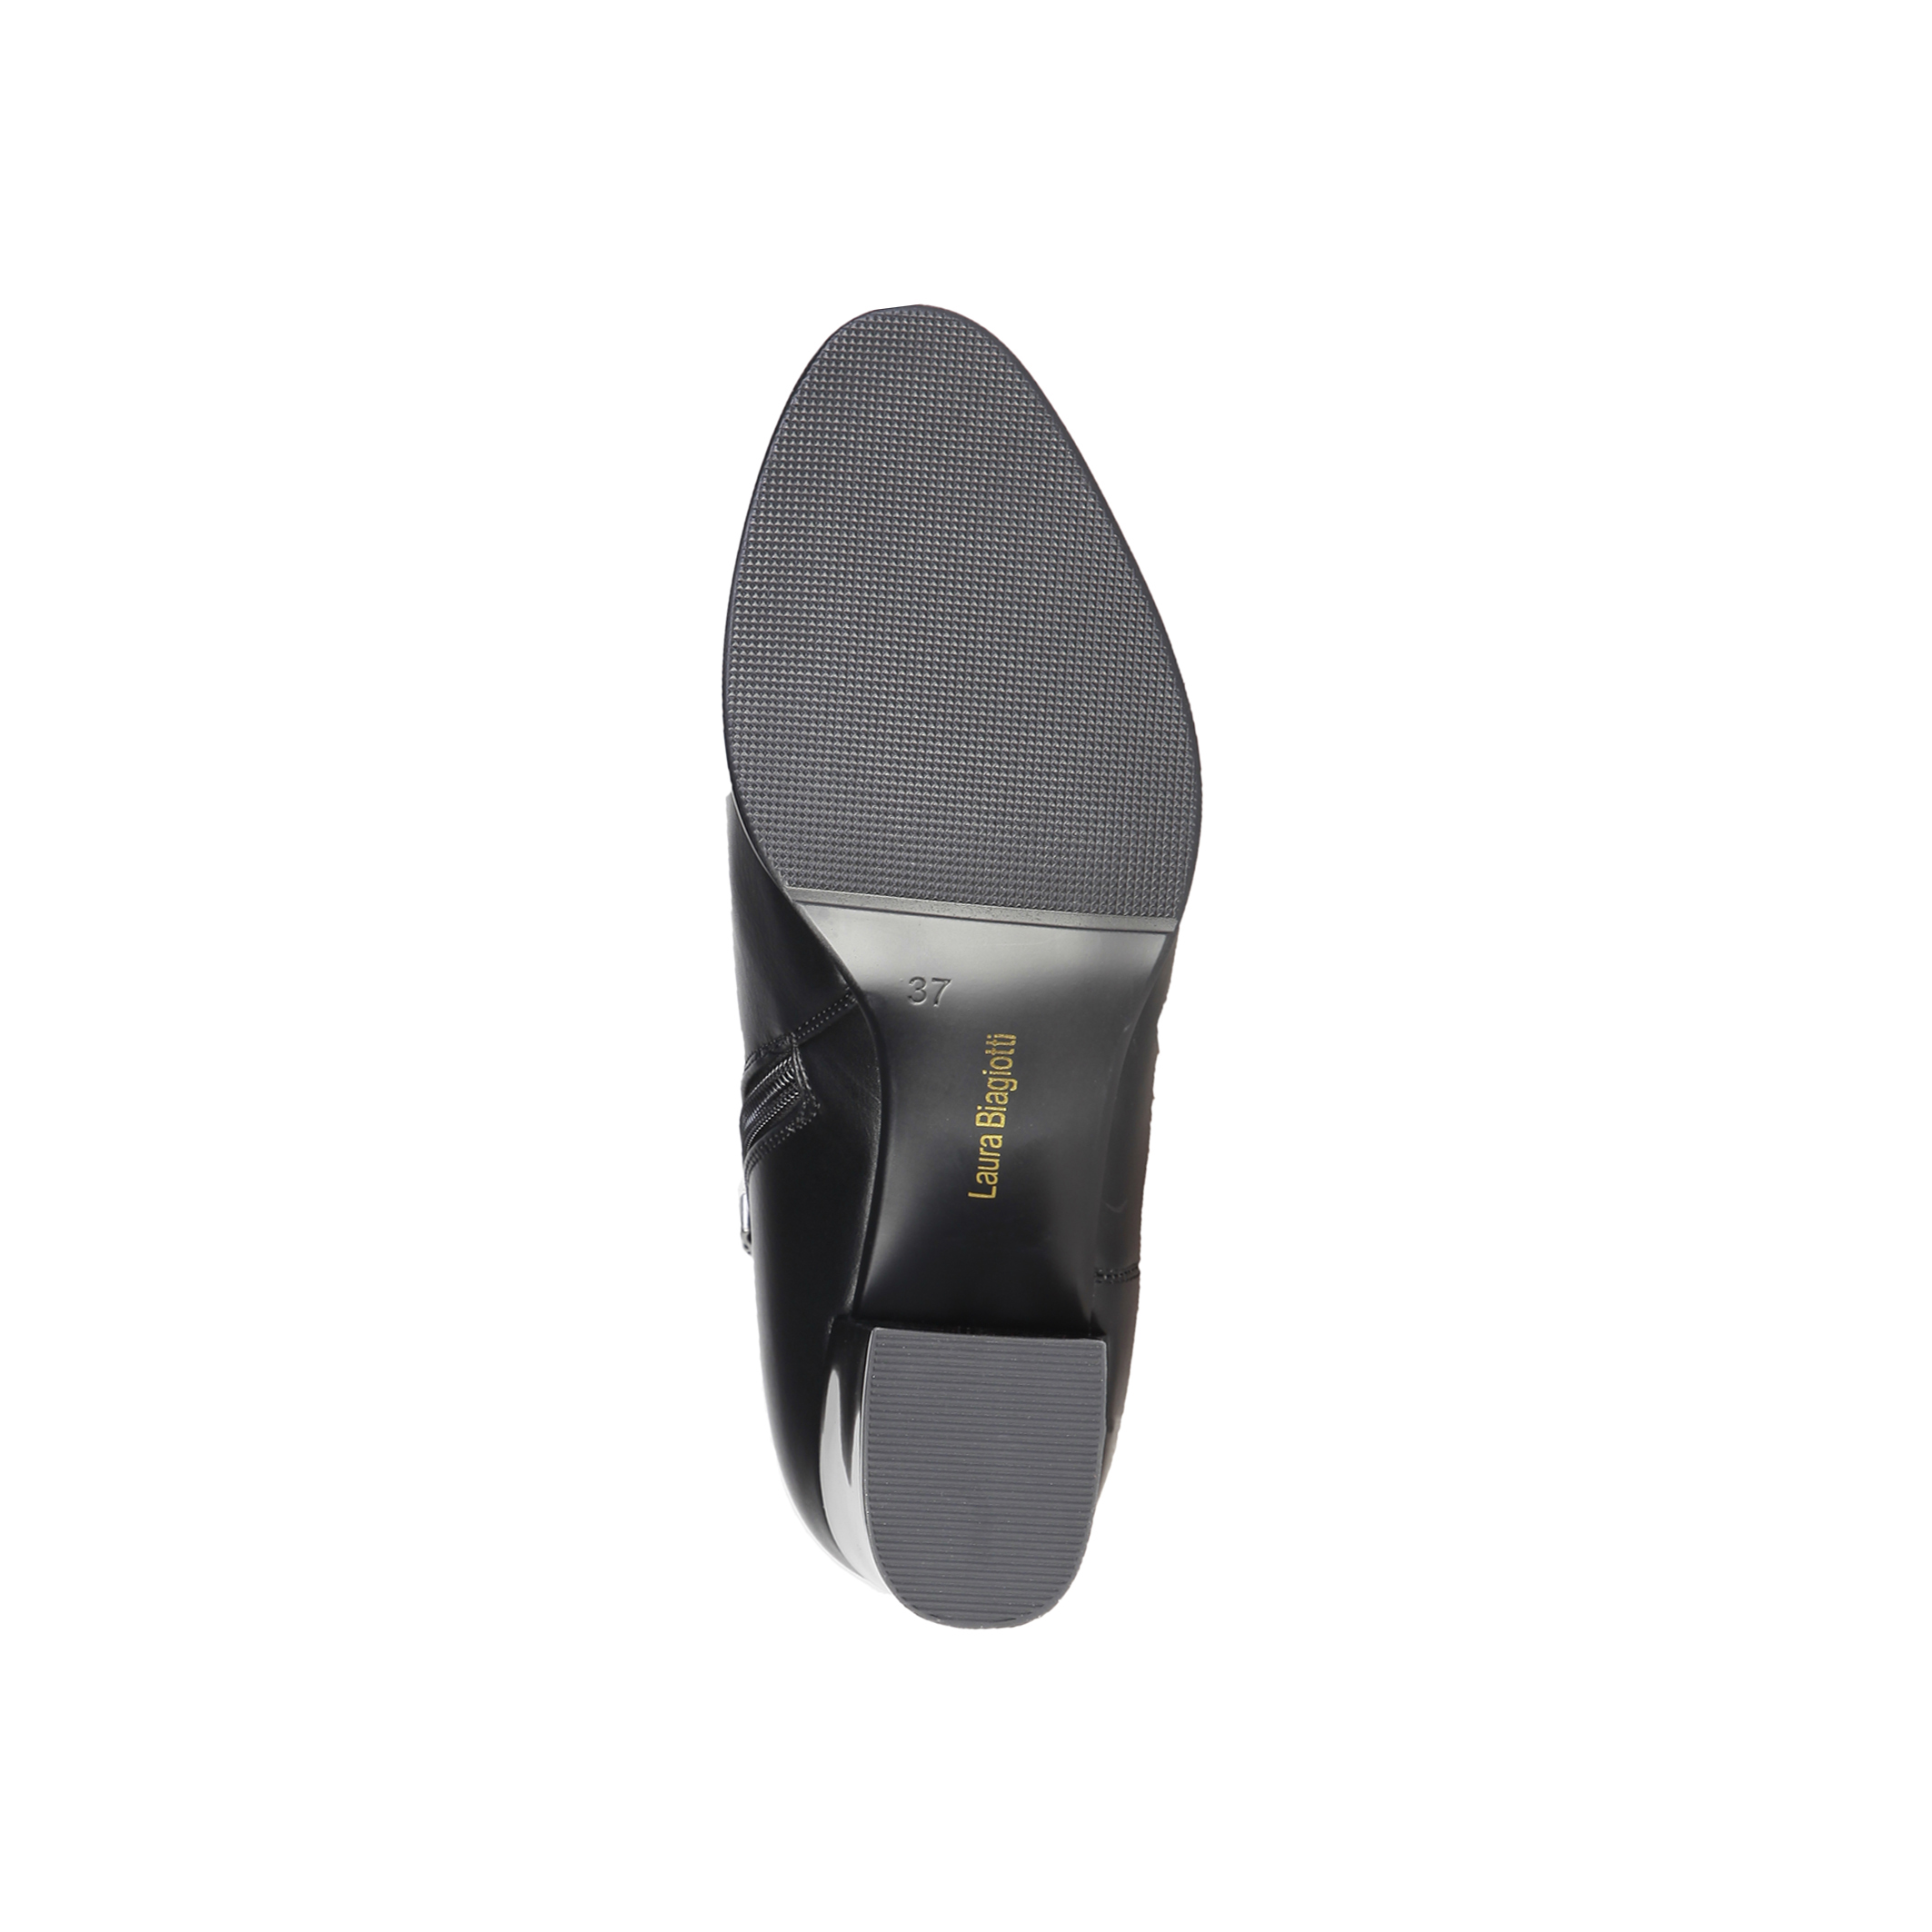 Chaussures de ville  Laura Biagiotti 2173 black